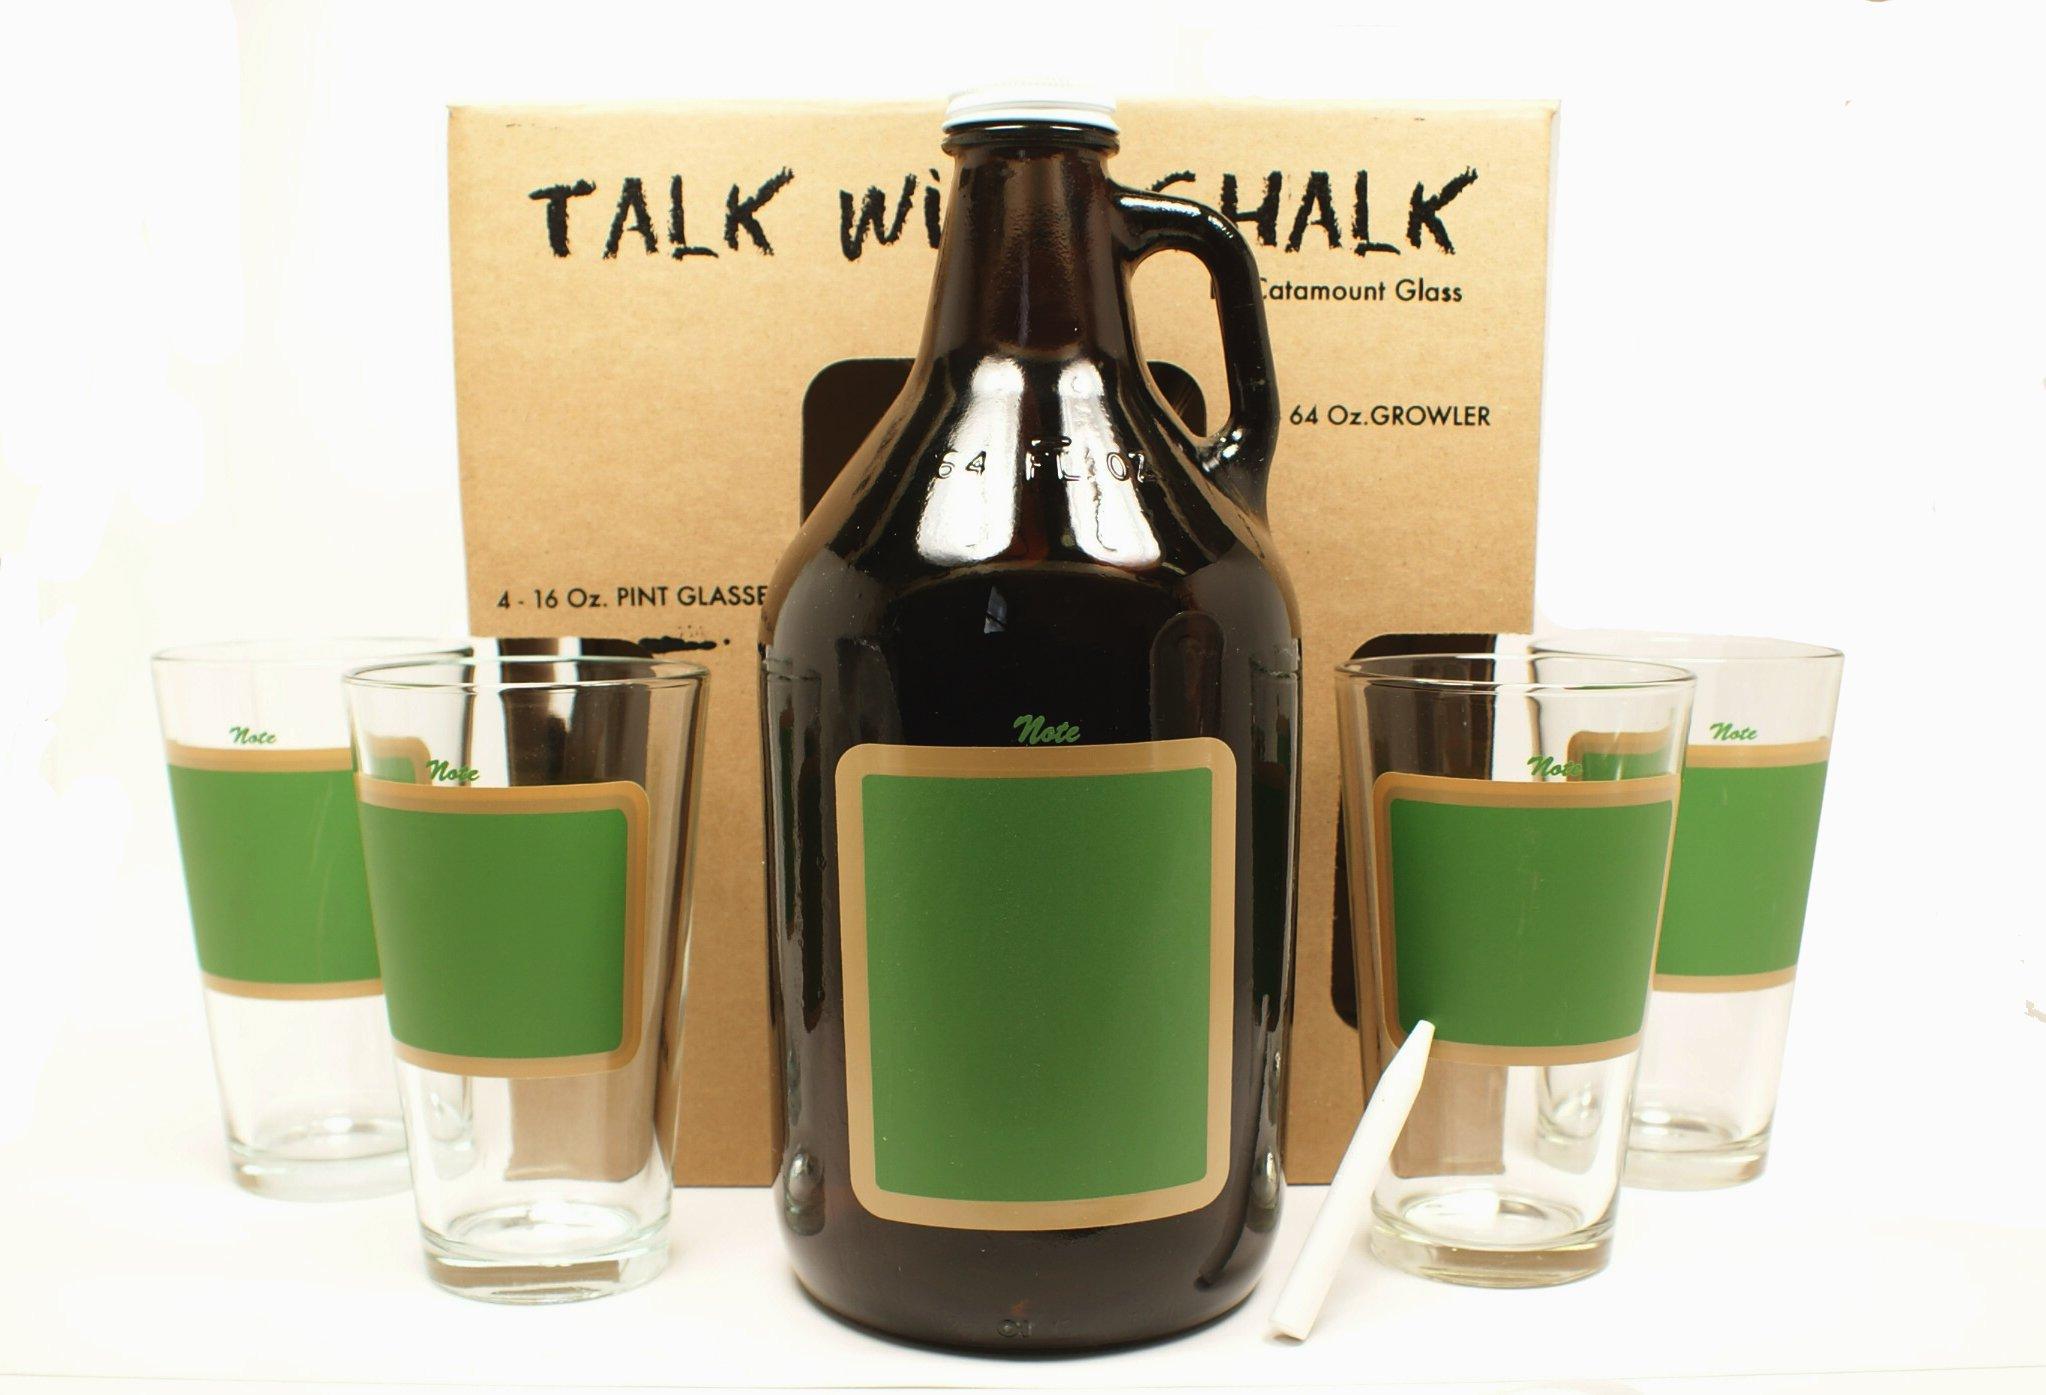 Catamount Glassware 5-Piece ''Talk With Chalk'' Growler Set, Green Chalkboard